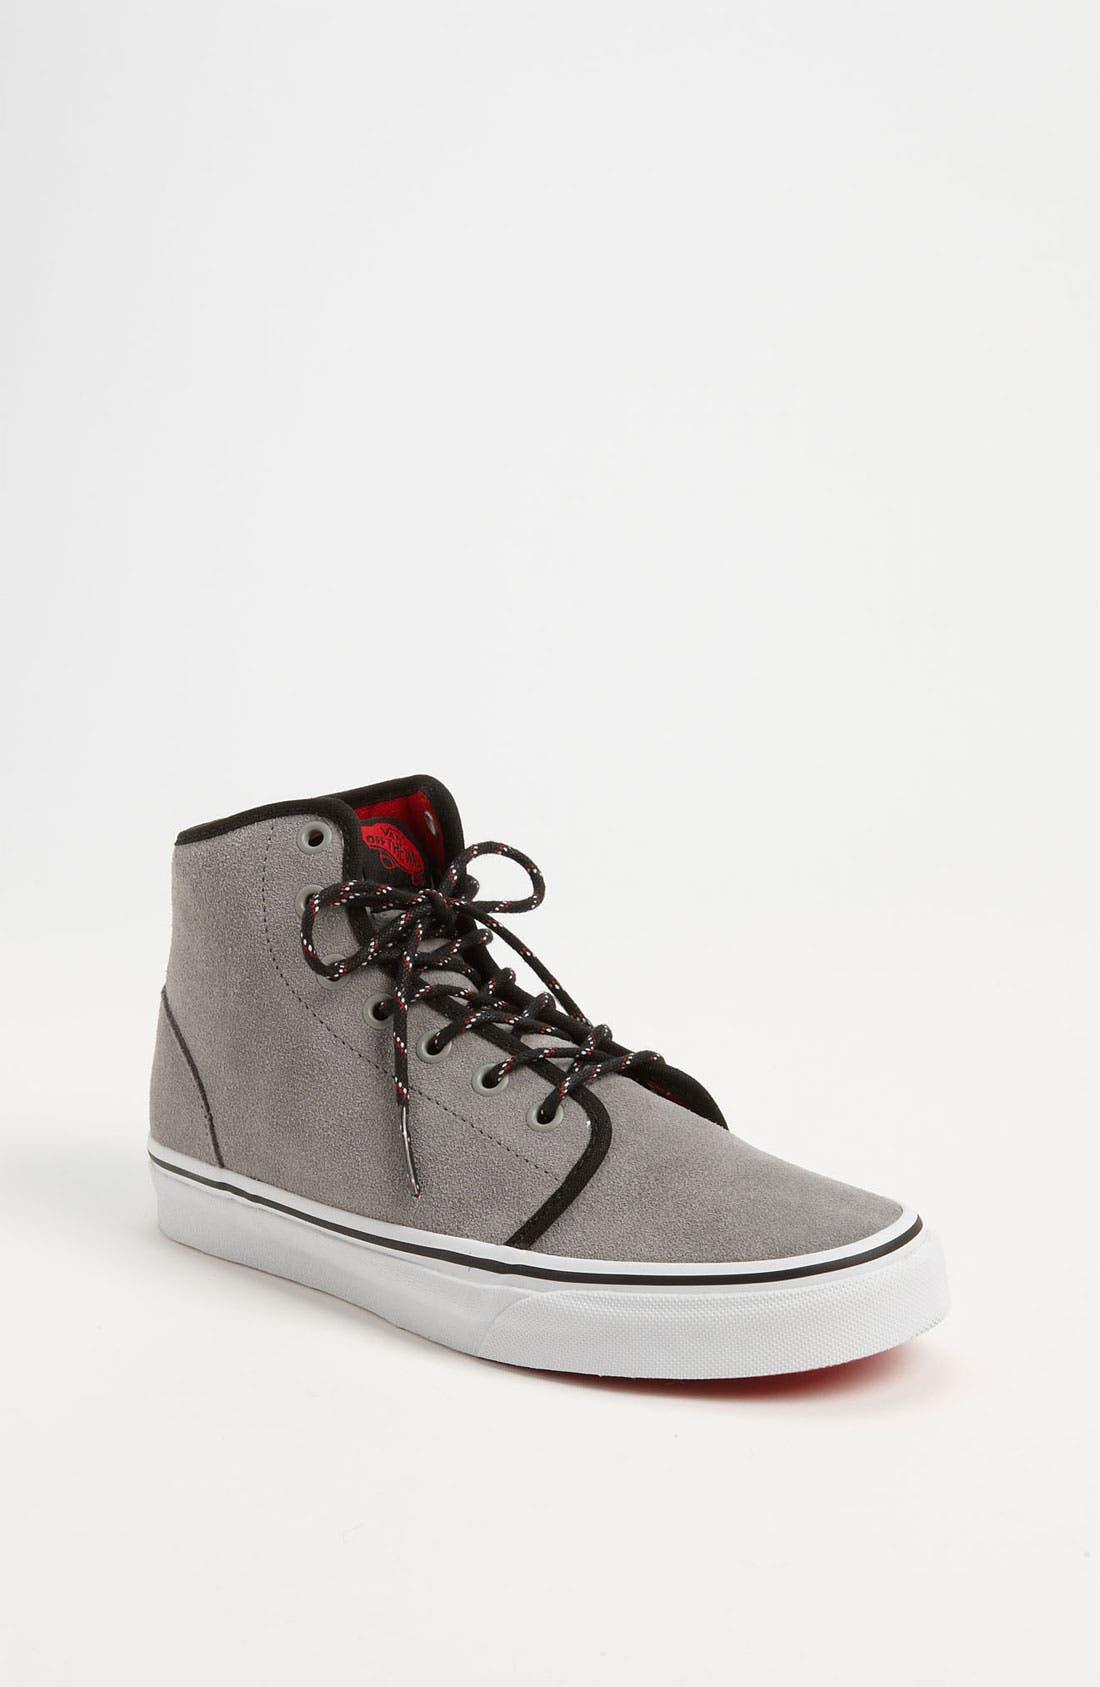 Main Image - Vans '106 - Hi' Sneaker (Toddler, Little Kid & Big Kid)